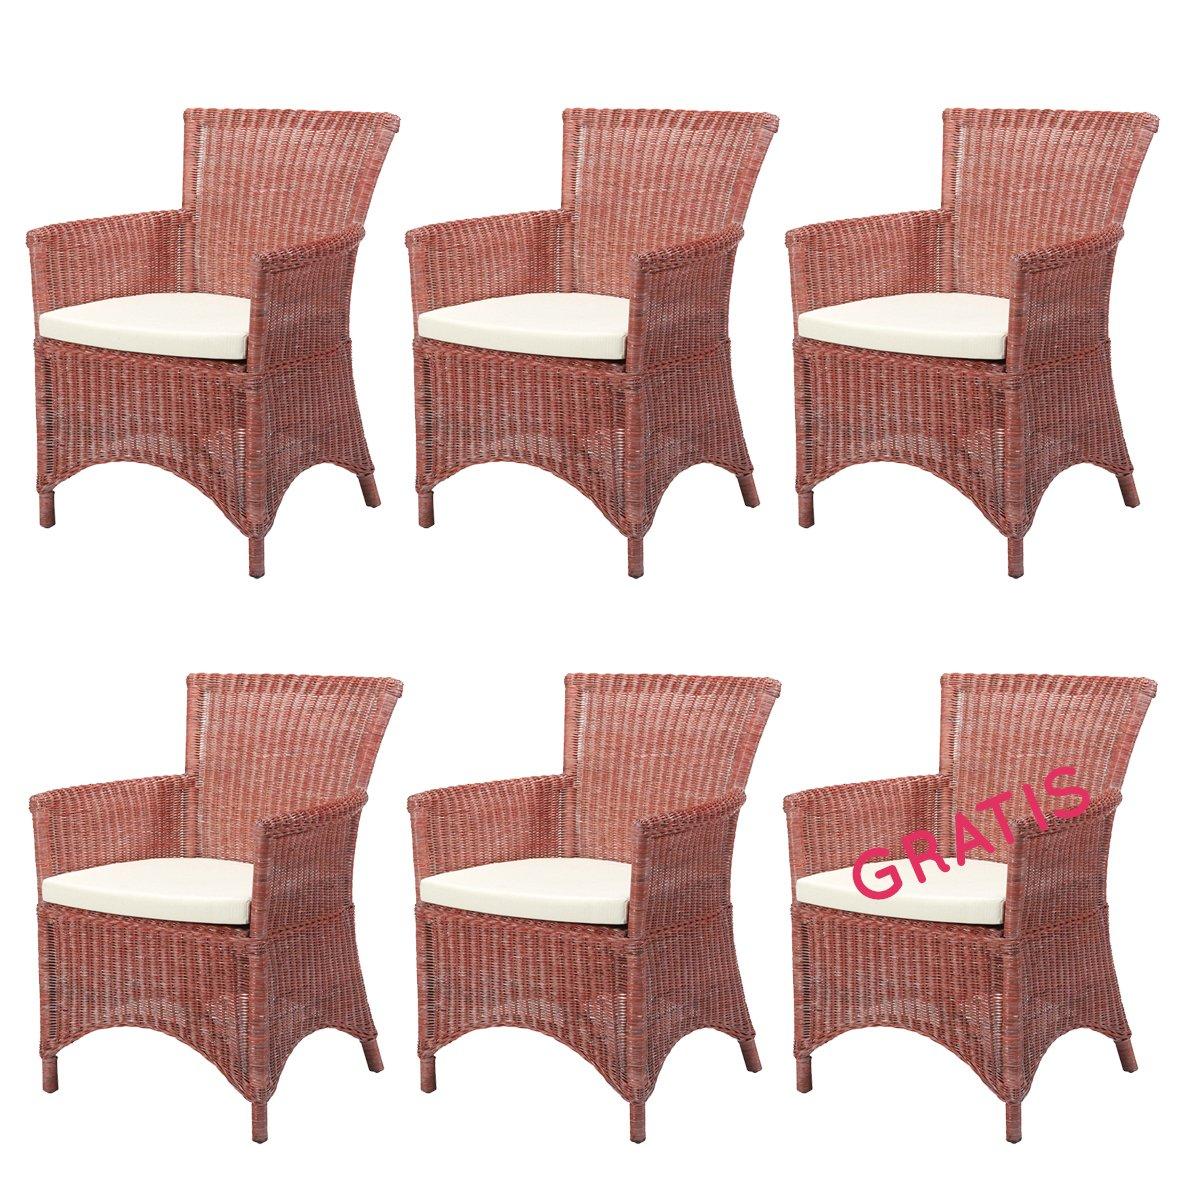 6x Rattan Sessel Rosas Rot Rattan Möbel Set Korbsessel Mit